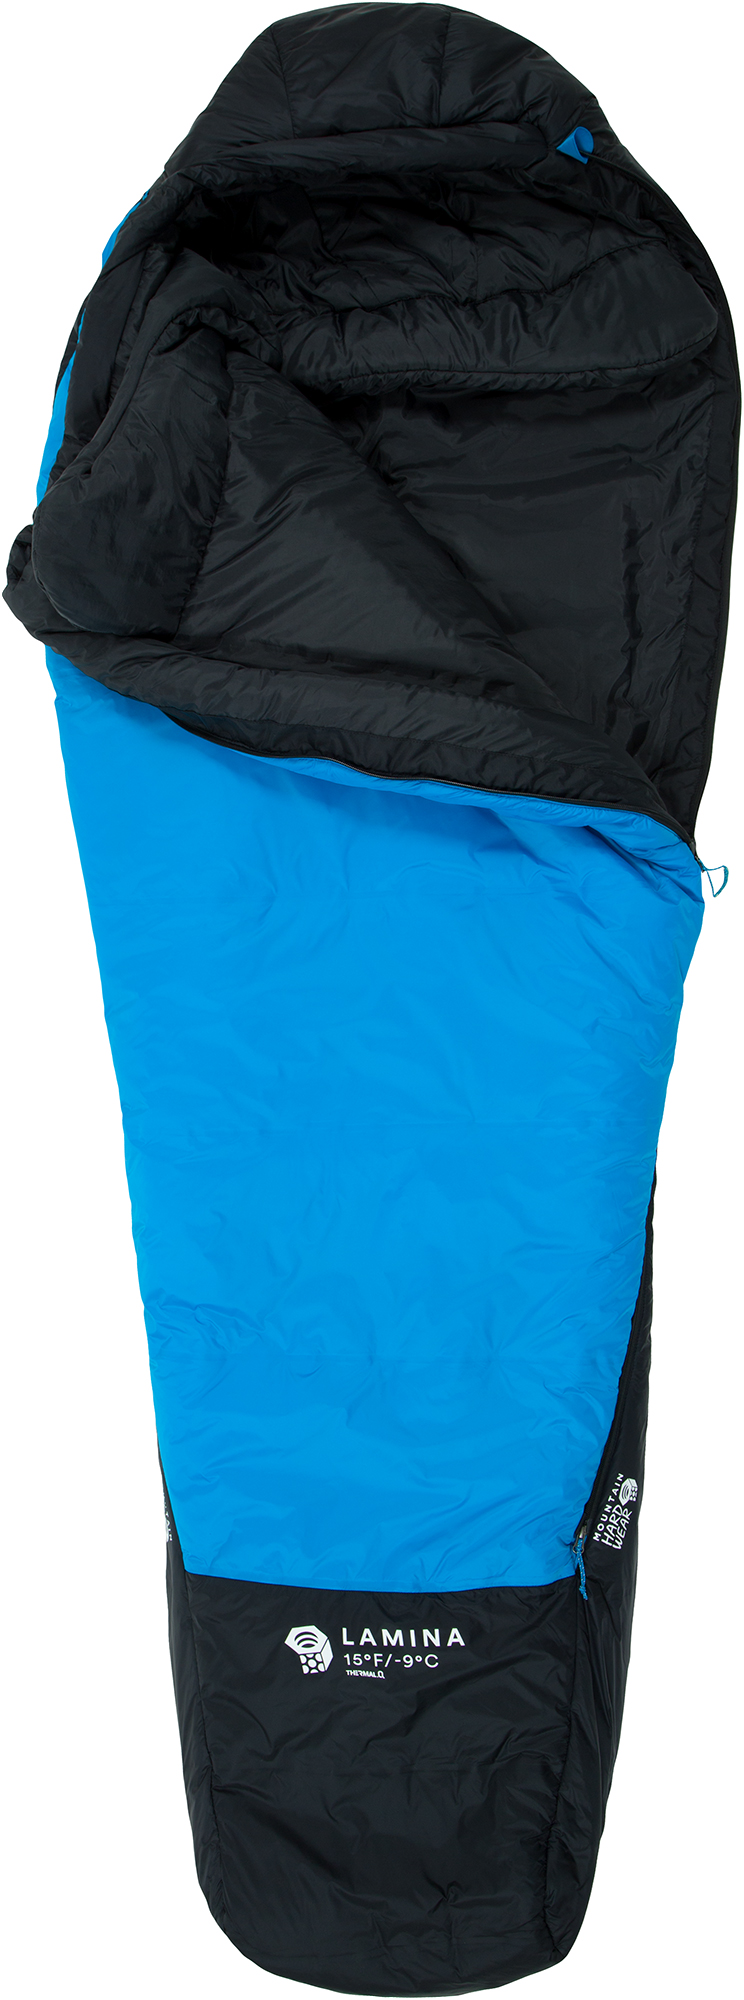 Mountain Hardwear Mountain Hardwear Lamina™ 15F/-9C